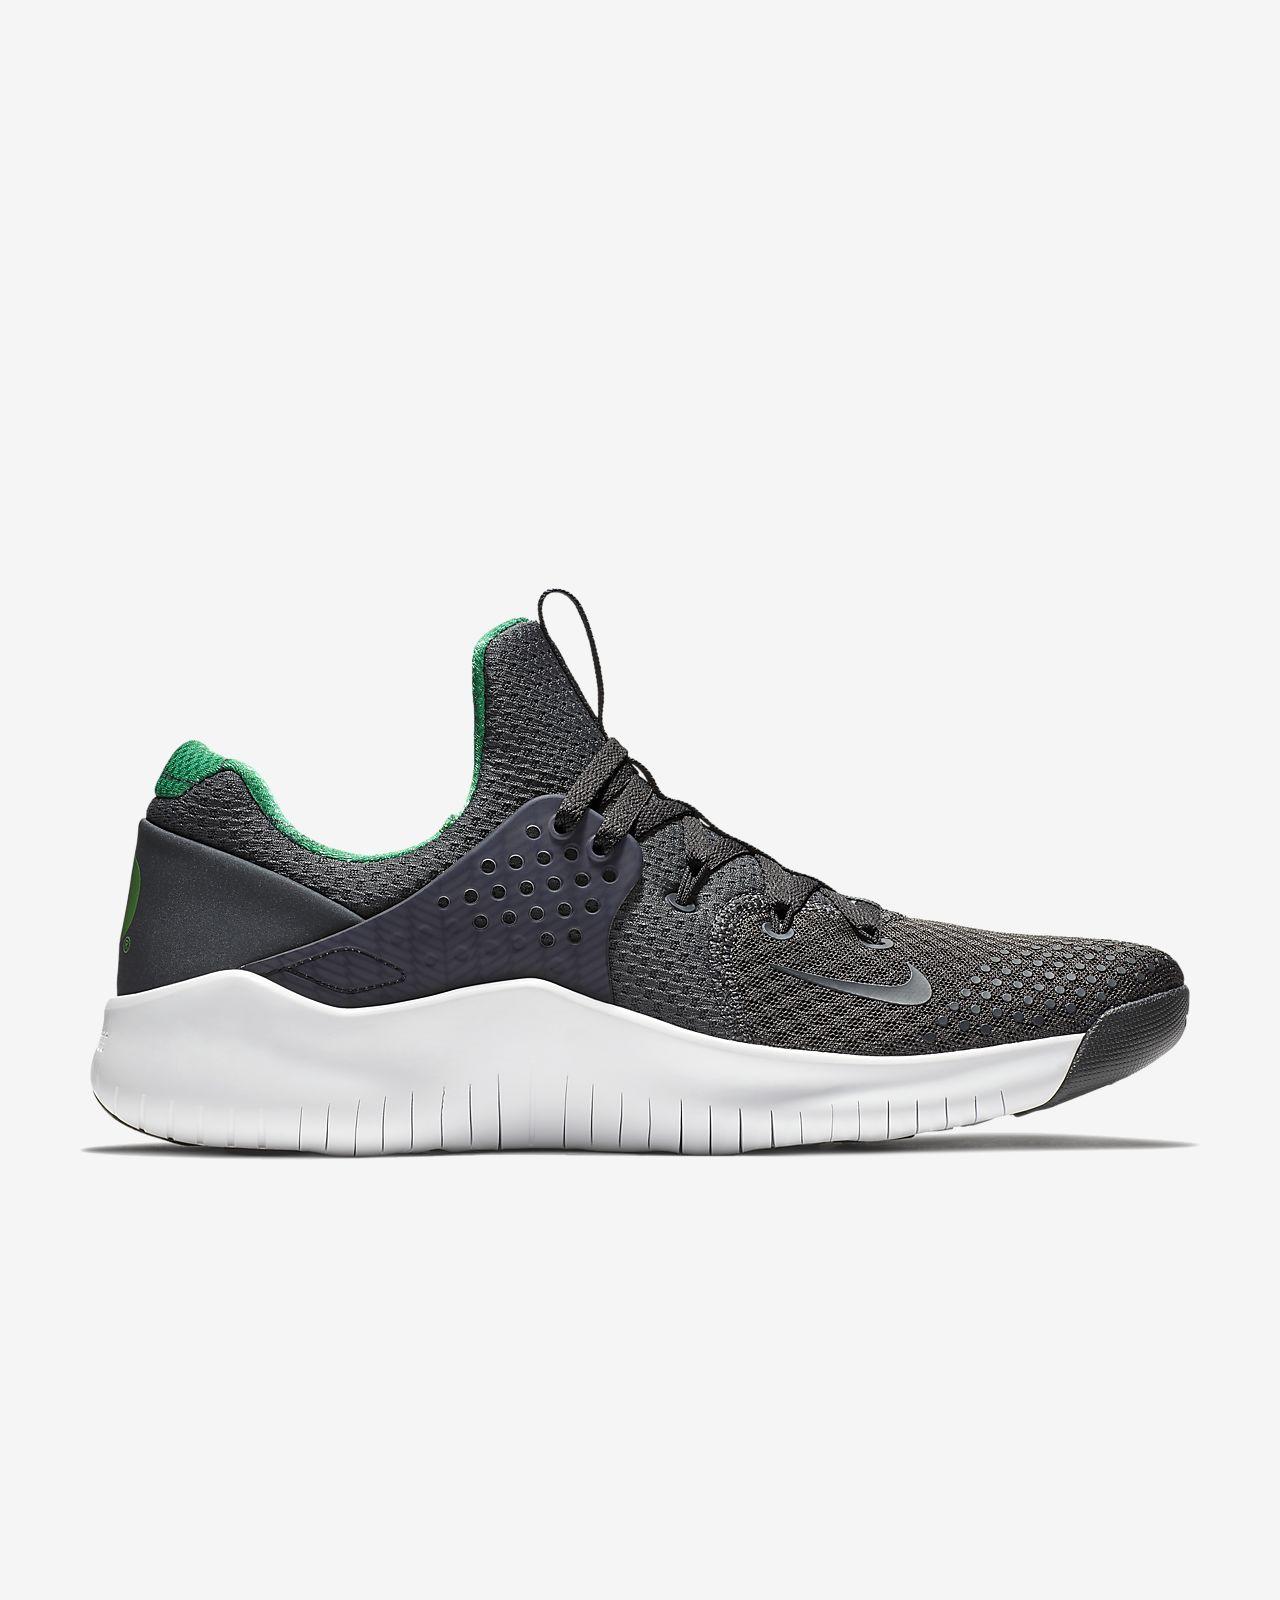 9f5872840f4c2 Nike Free TR8 (Oregon) Gym Gameday Shoe. Nike.com